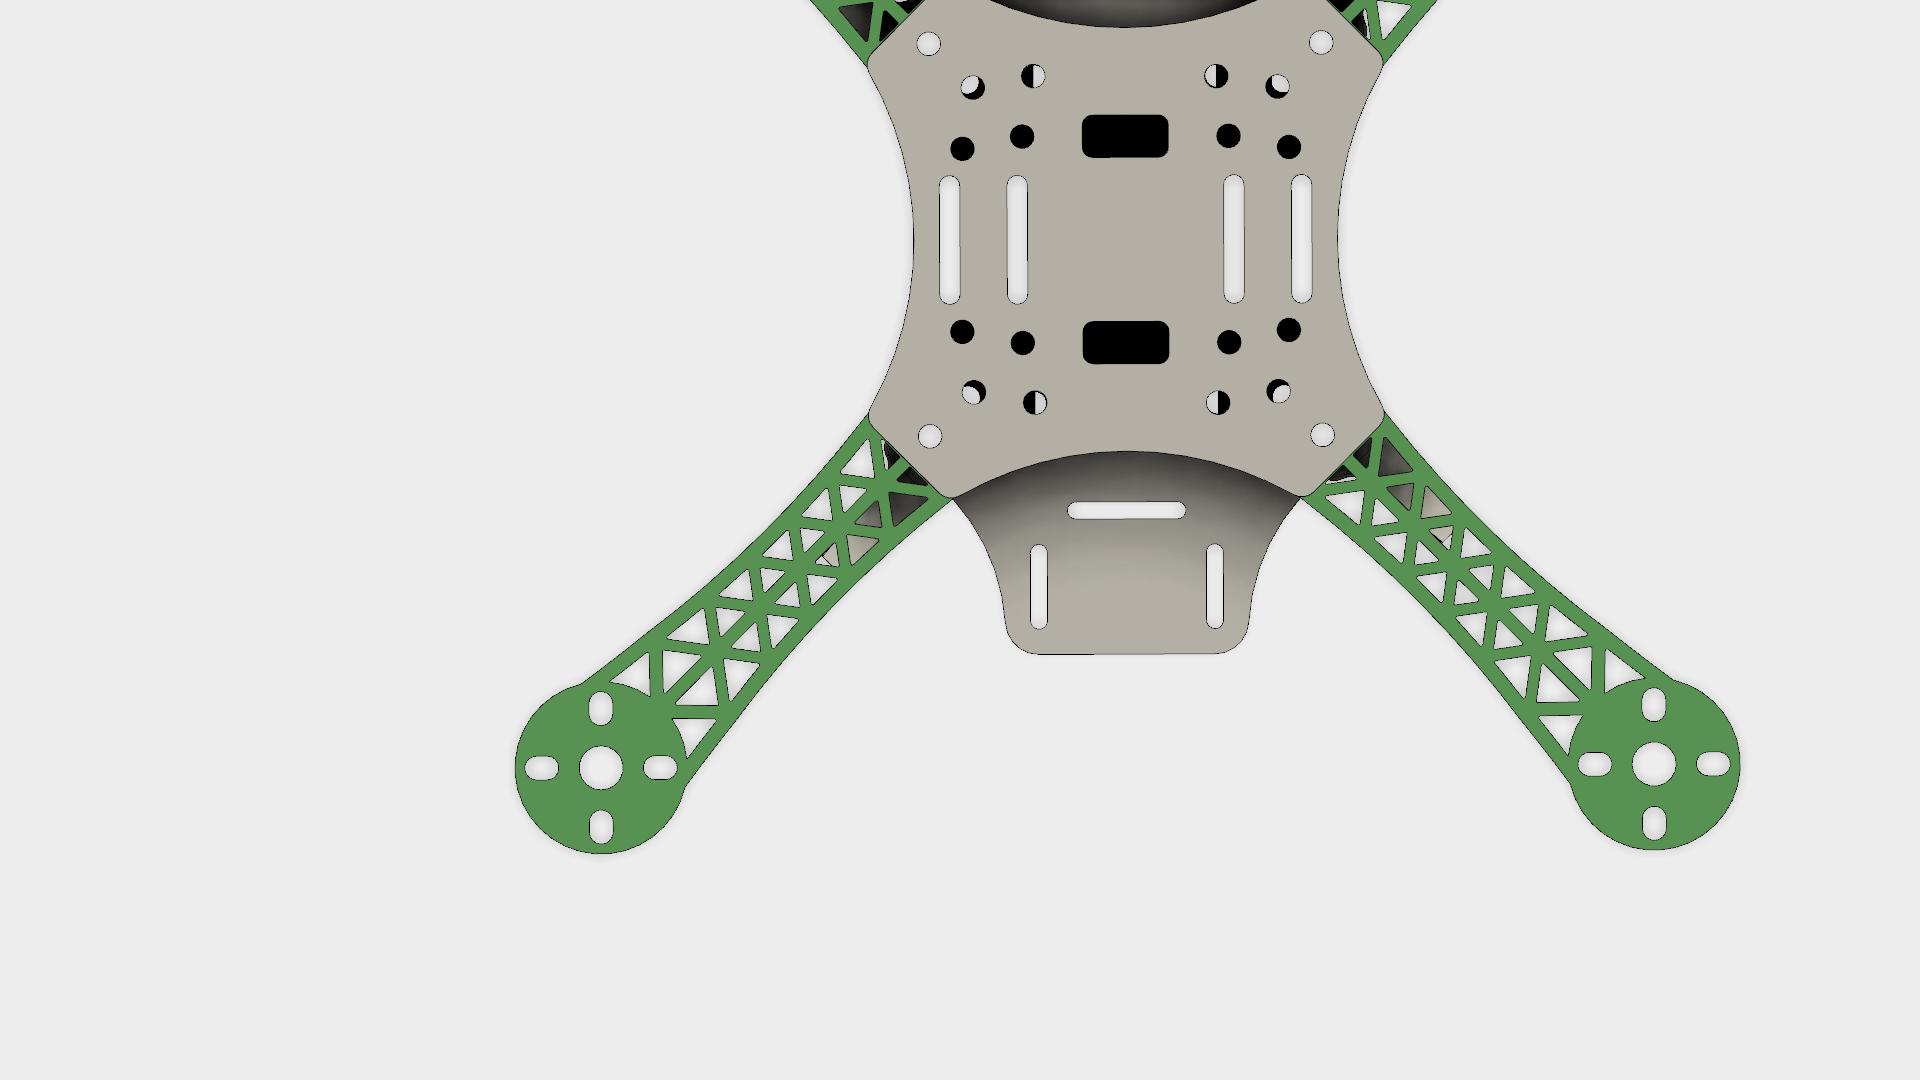 Modular DJI Flamewheel Quadcopter Frame - 220/250/280mm by ...